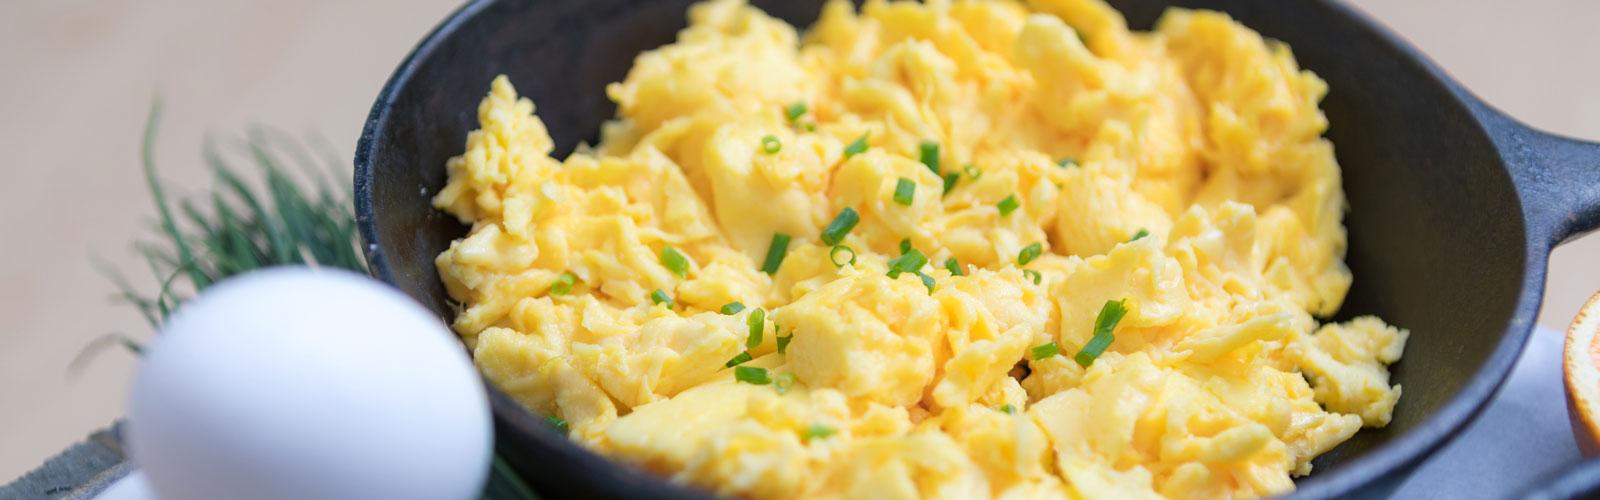 Skillet of scrambled eggs